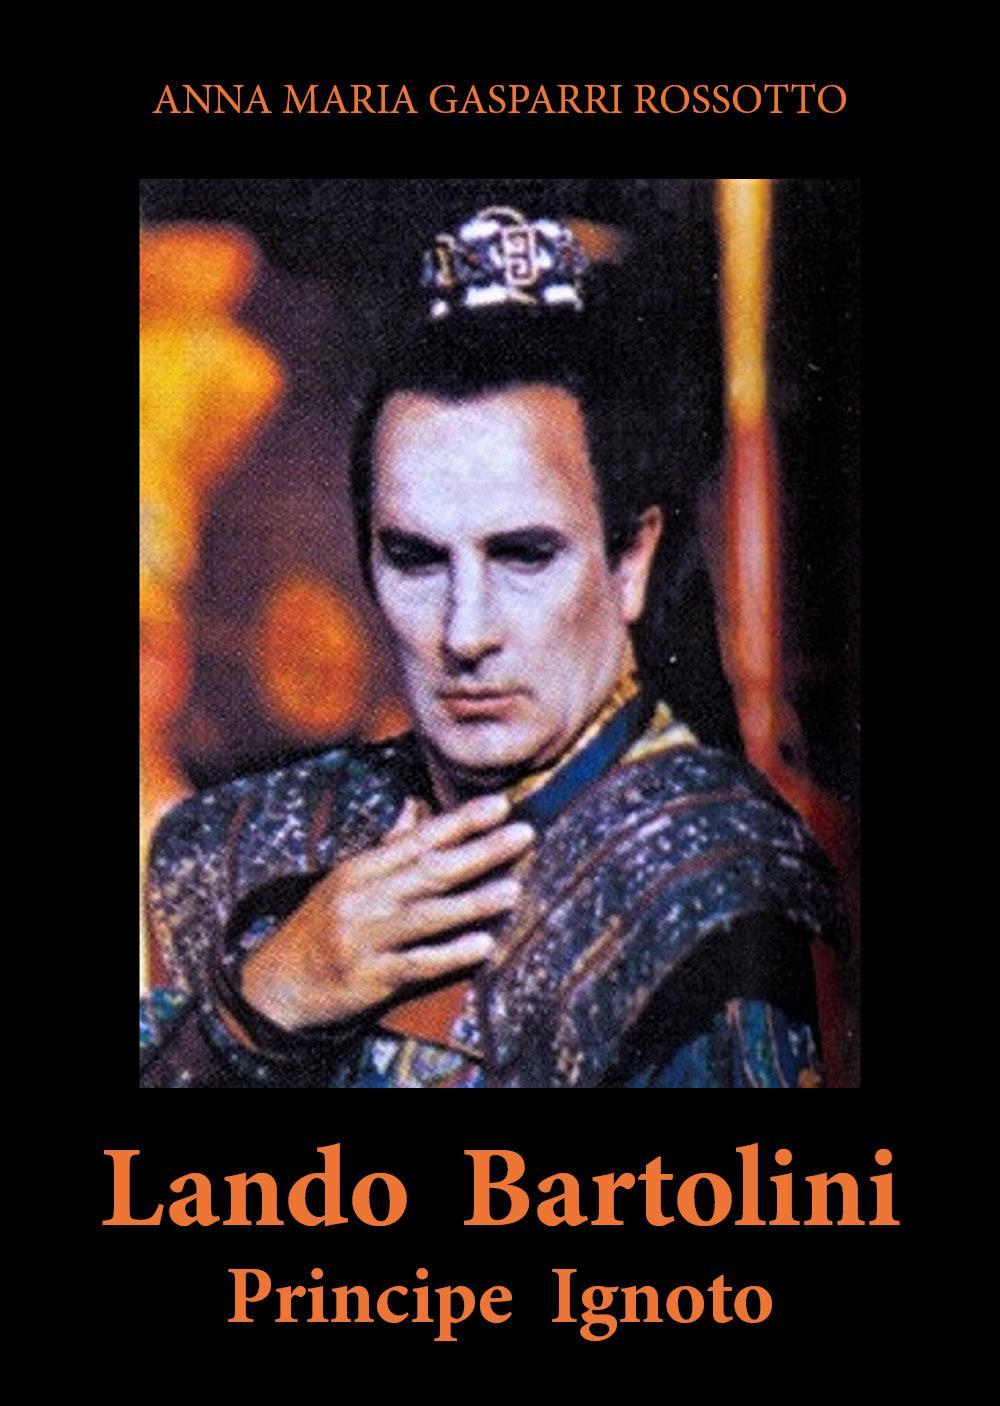 LANDO BARTOLINI  Principe Ignoto